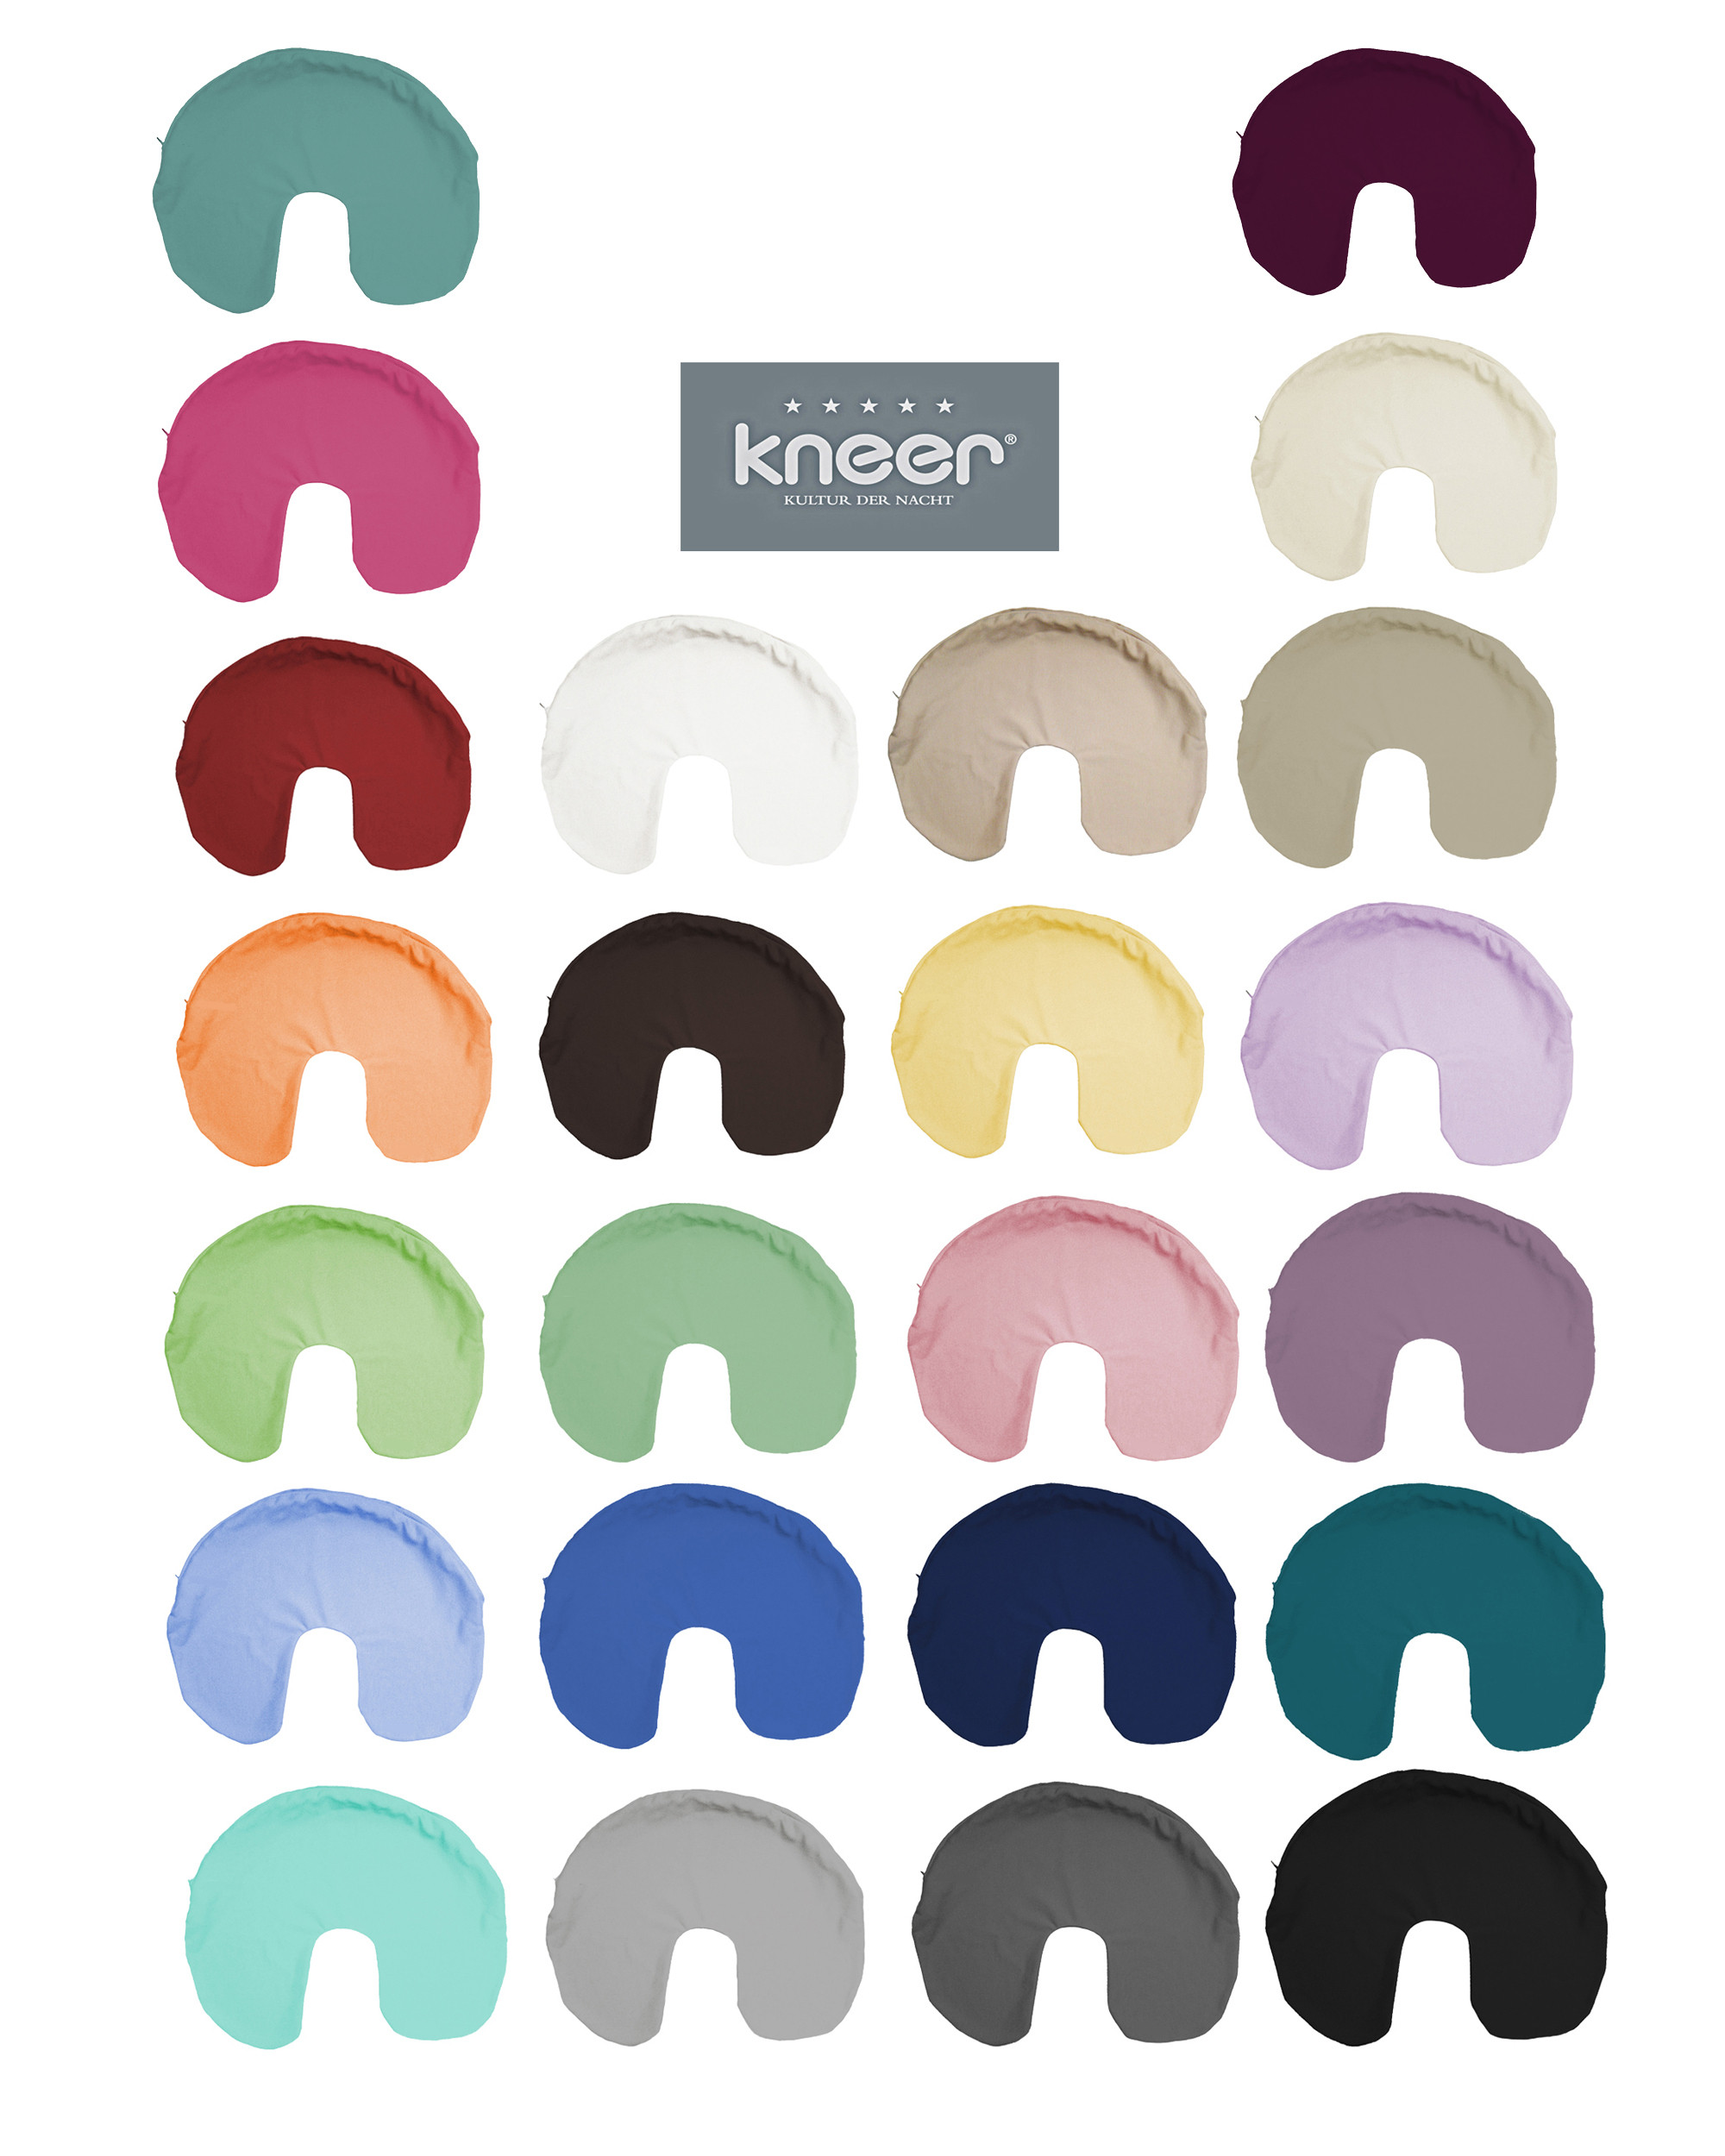 Kneer Nackenhörnchen Nackenkissen Bezug Mako Interlock Jersey in 23 Farben